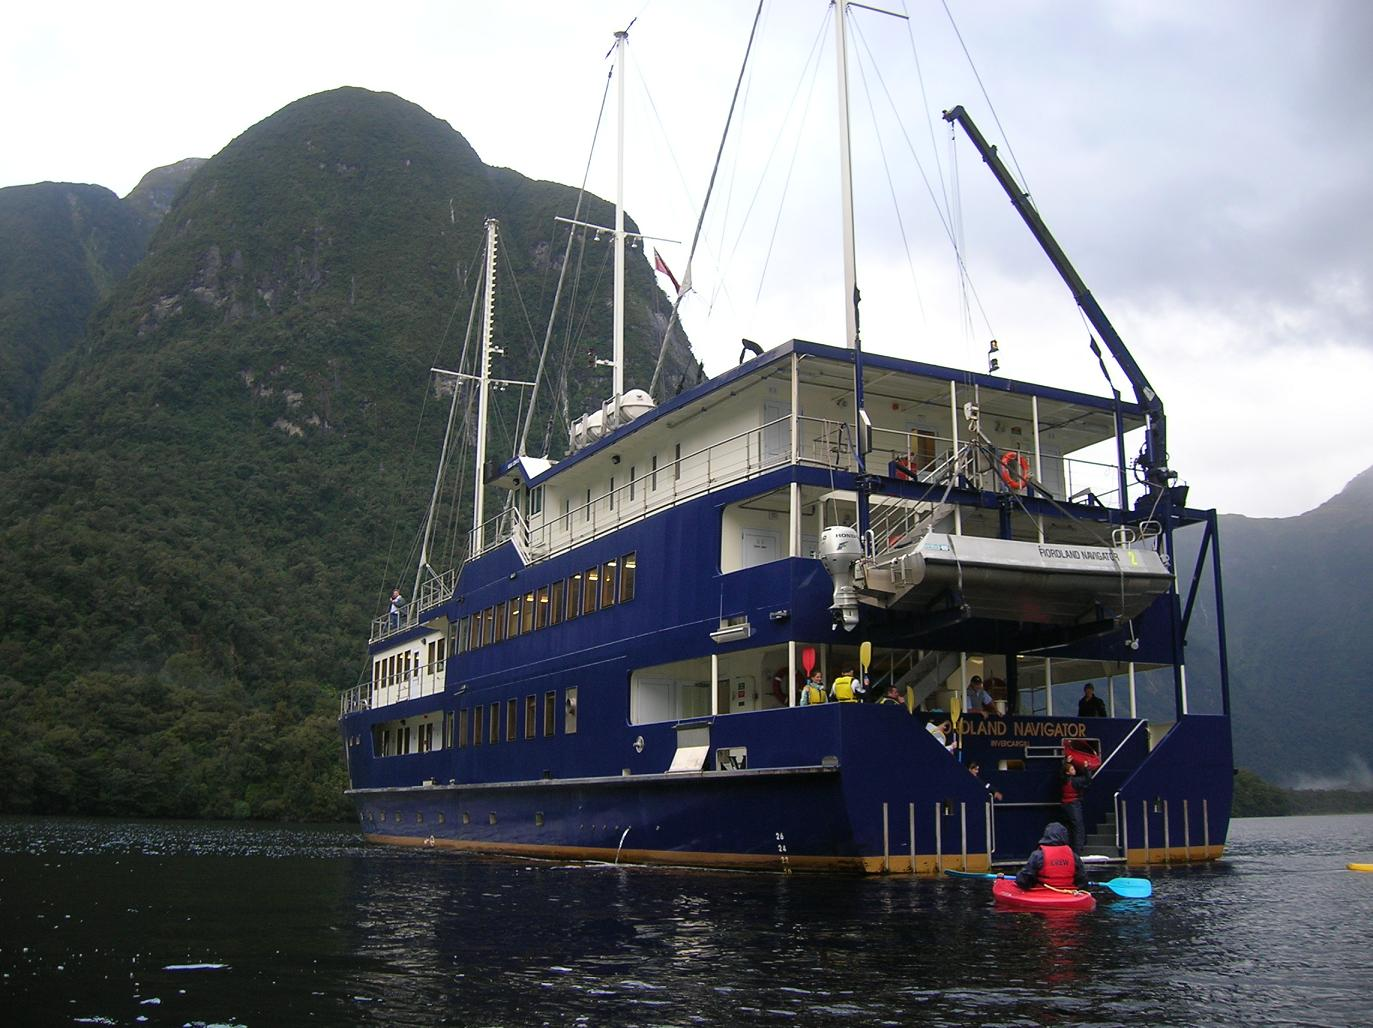 Die Fjordland Navigator